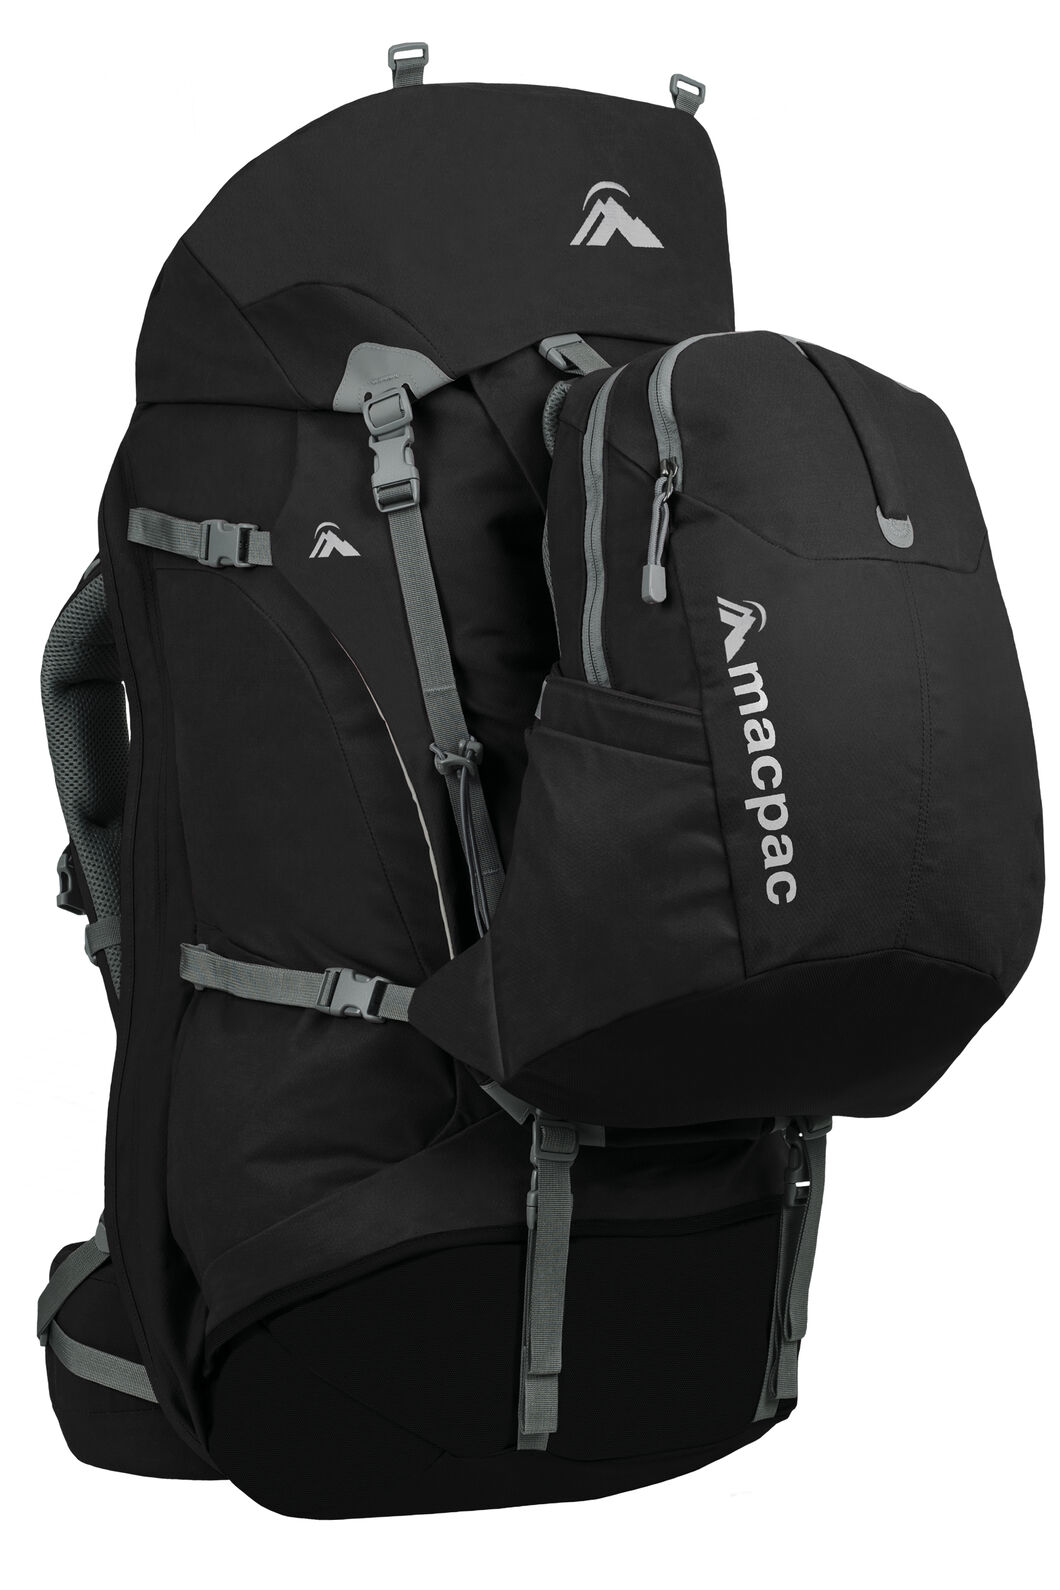 Genesis AzTec® 85L Travel Pack, Black, hi-res